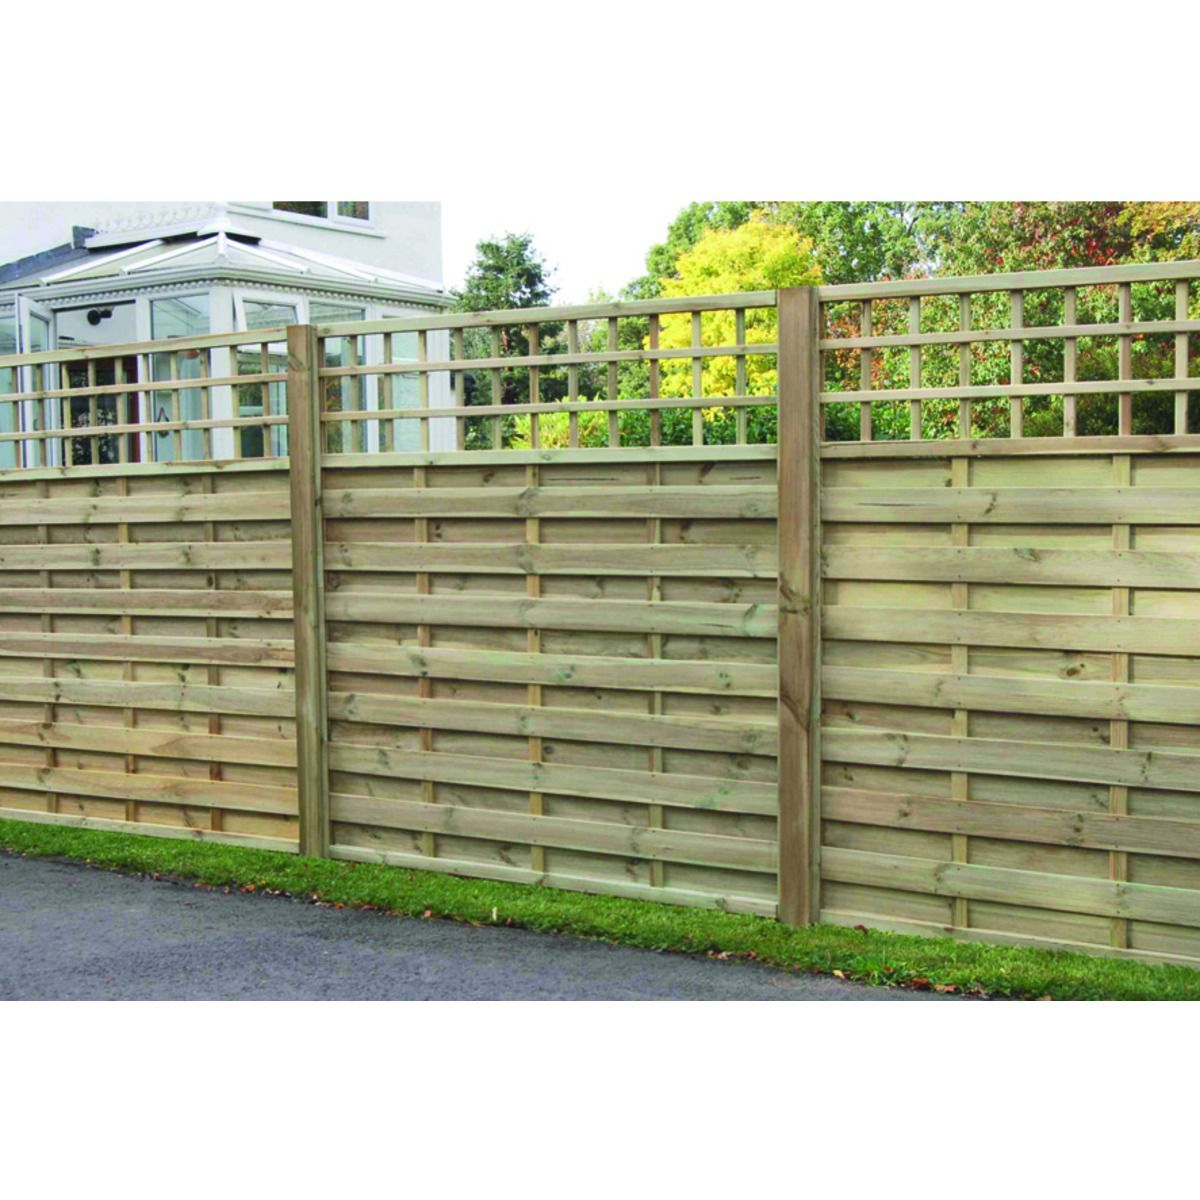 Wickes hertford fence panel 18m x 18m integrated trellis fence wickes hertford fence panel 18m x 18m integrated trellis baanklon Choice Image